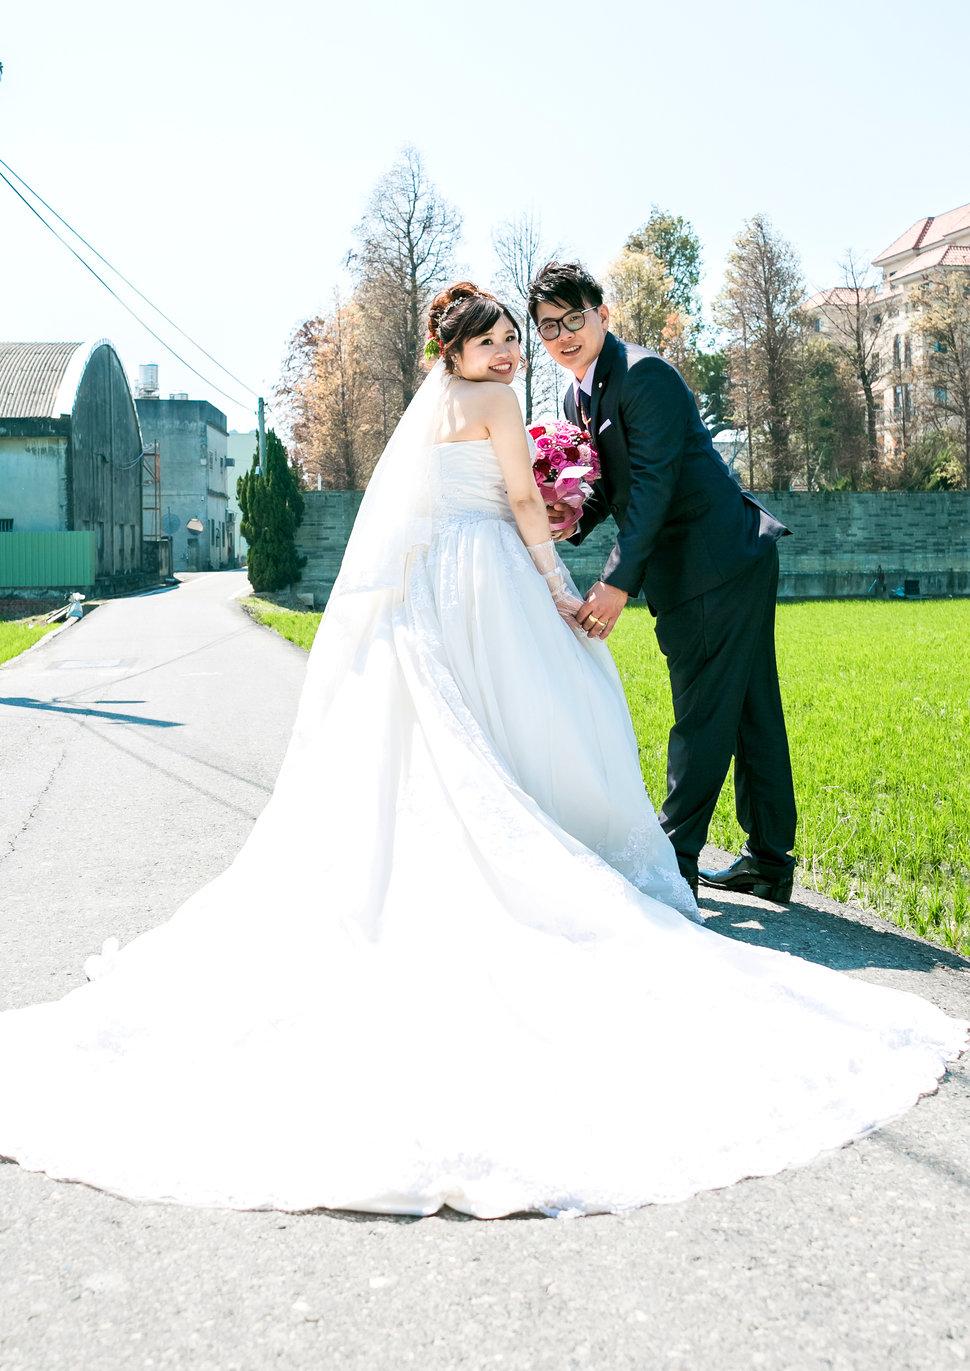 YF2A1994 - Yusin 攝影~與您同心祝福您永結同心 - 結婚吧